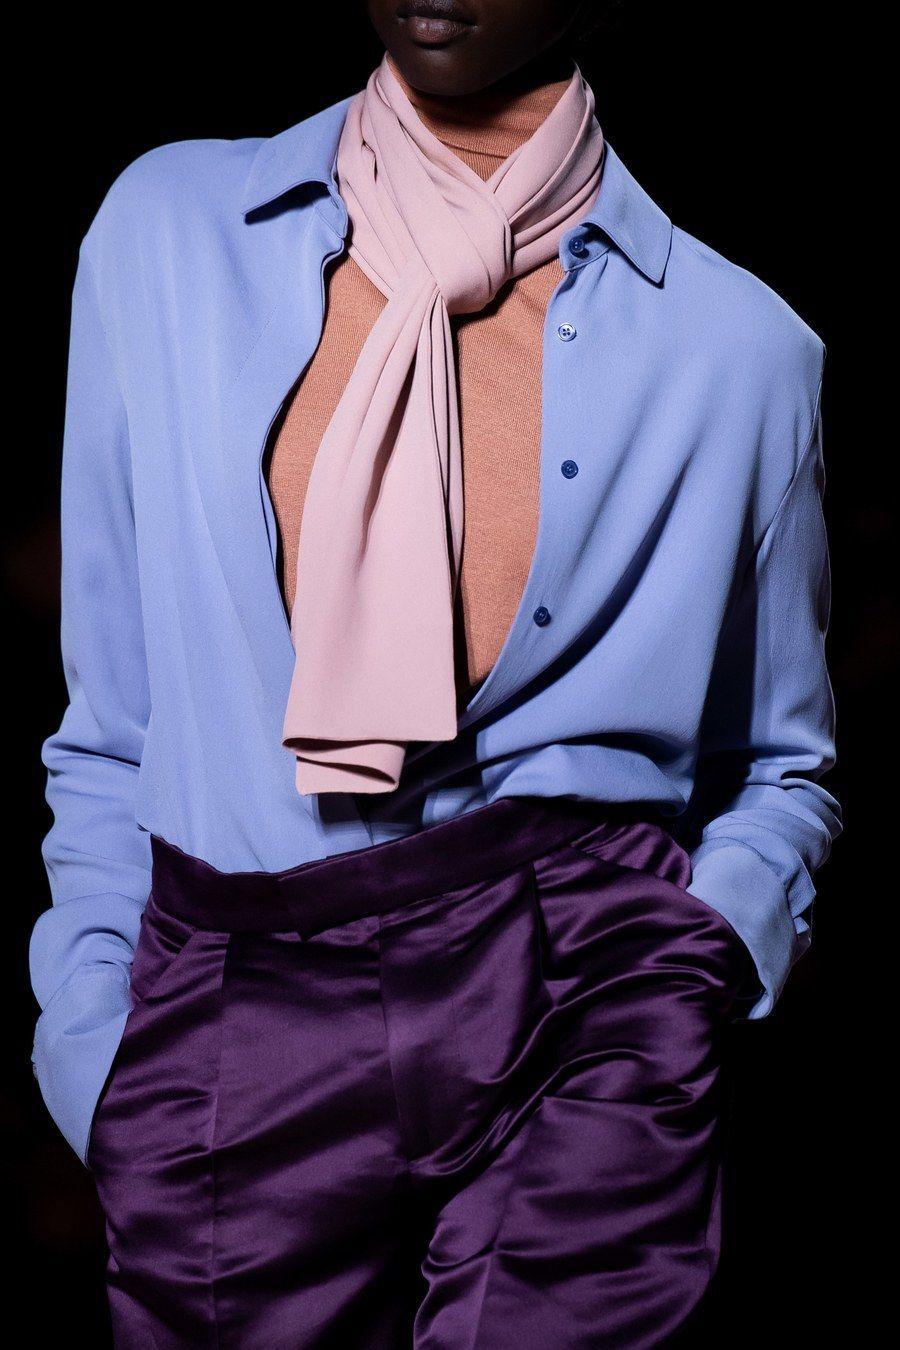 Tom Ford Fall 2019 Ready-to-Wear Fashion Show